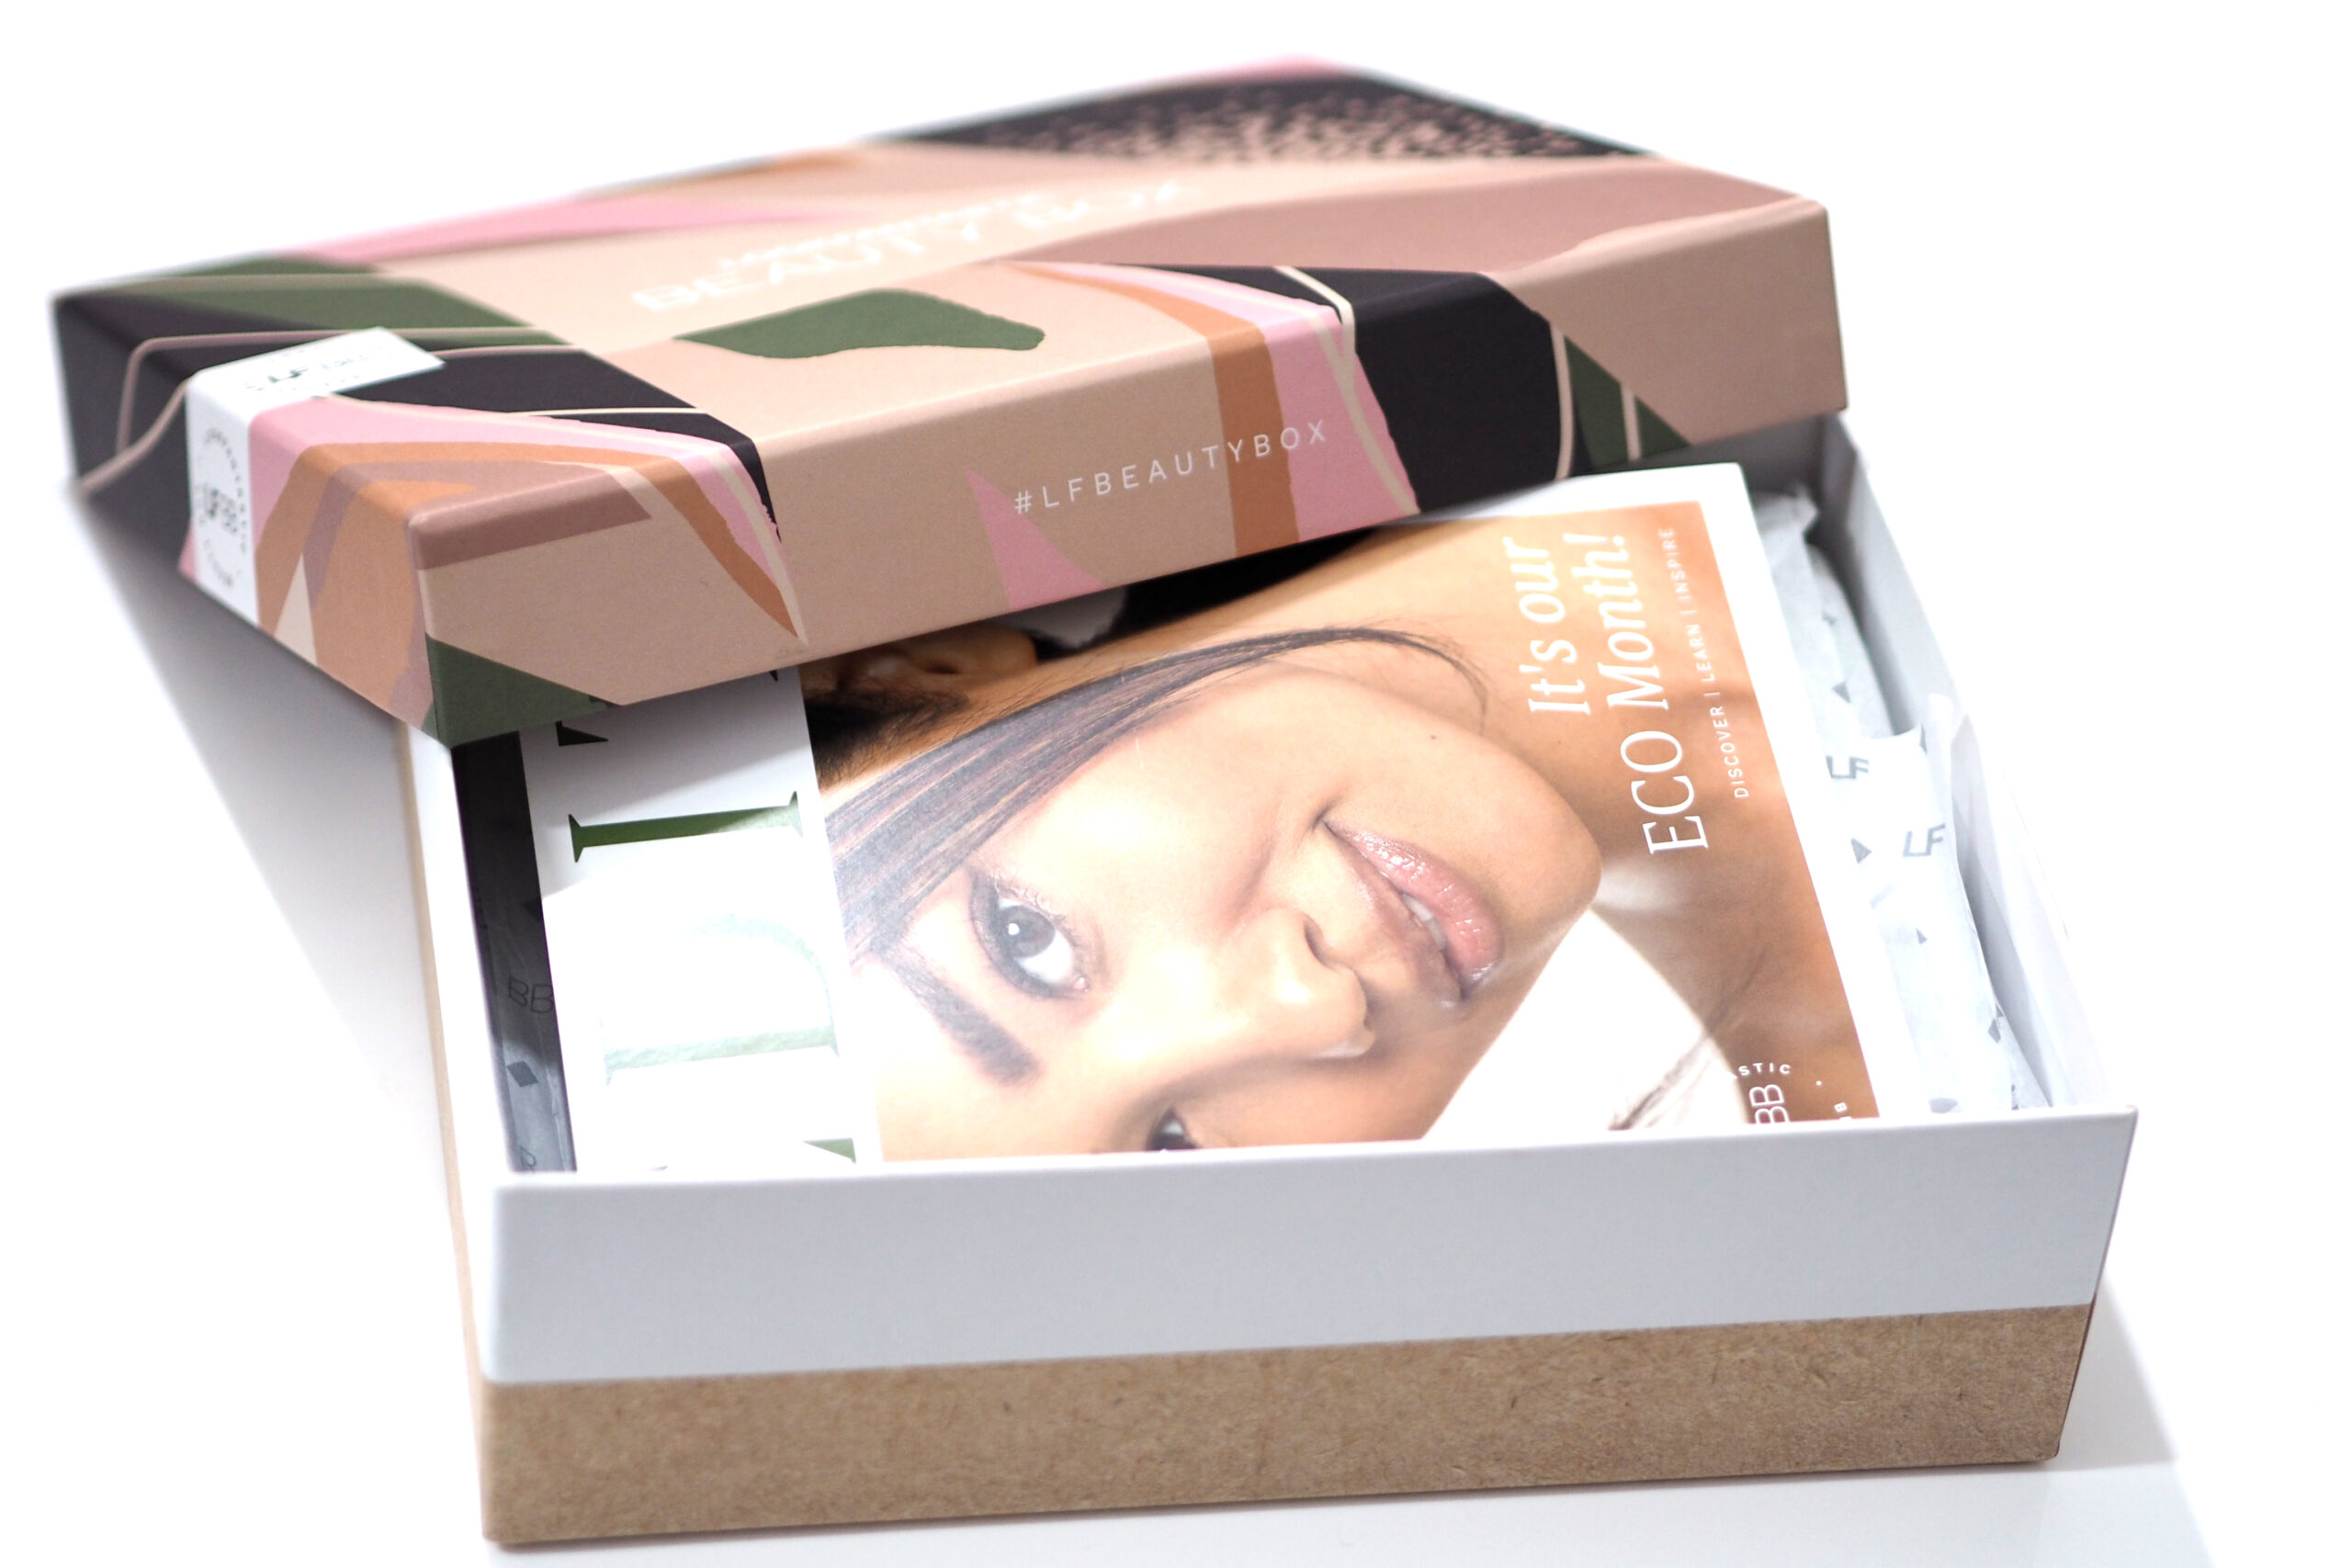 Lookfantastic Eco Elements Edition Beauty Box June 2021 Contents Reveal!